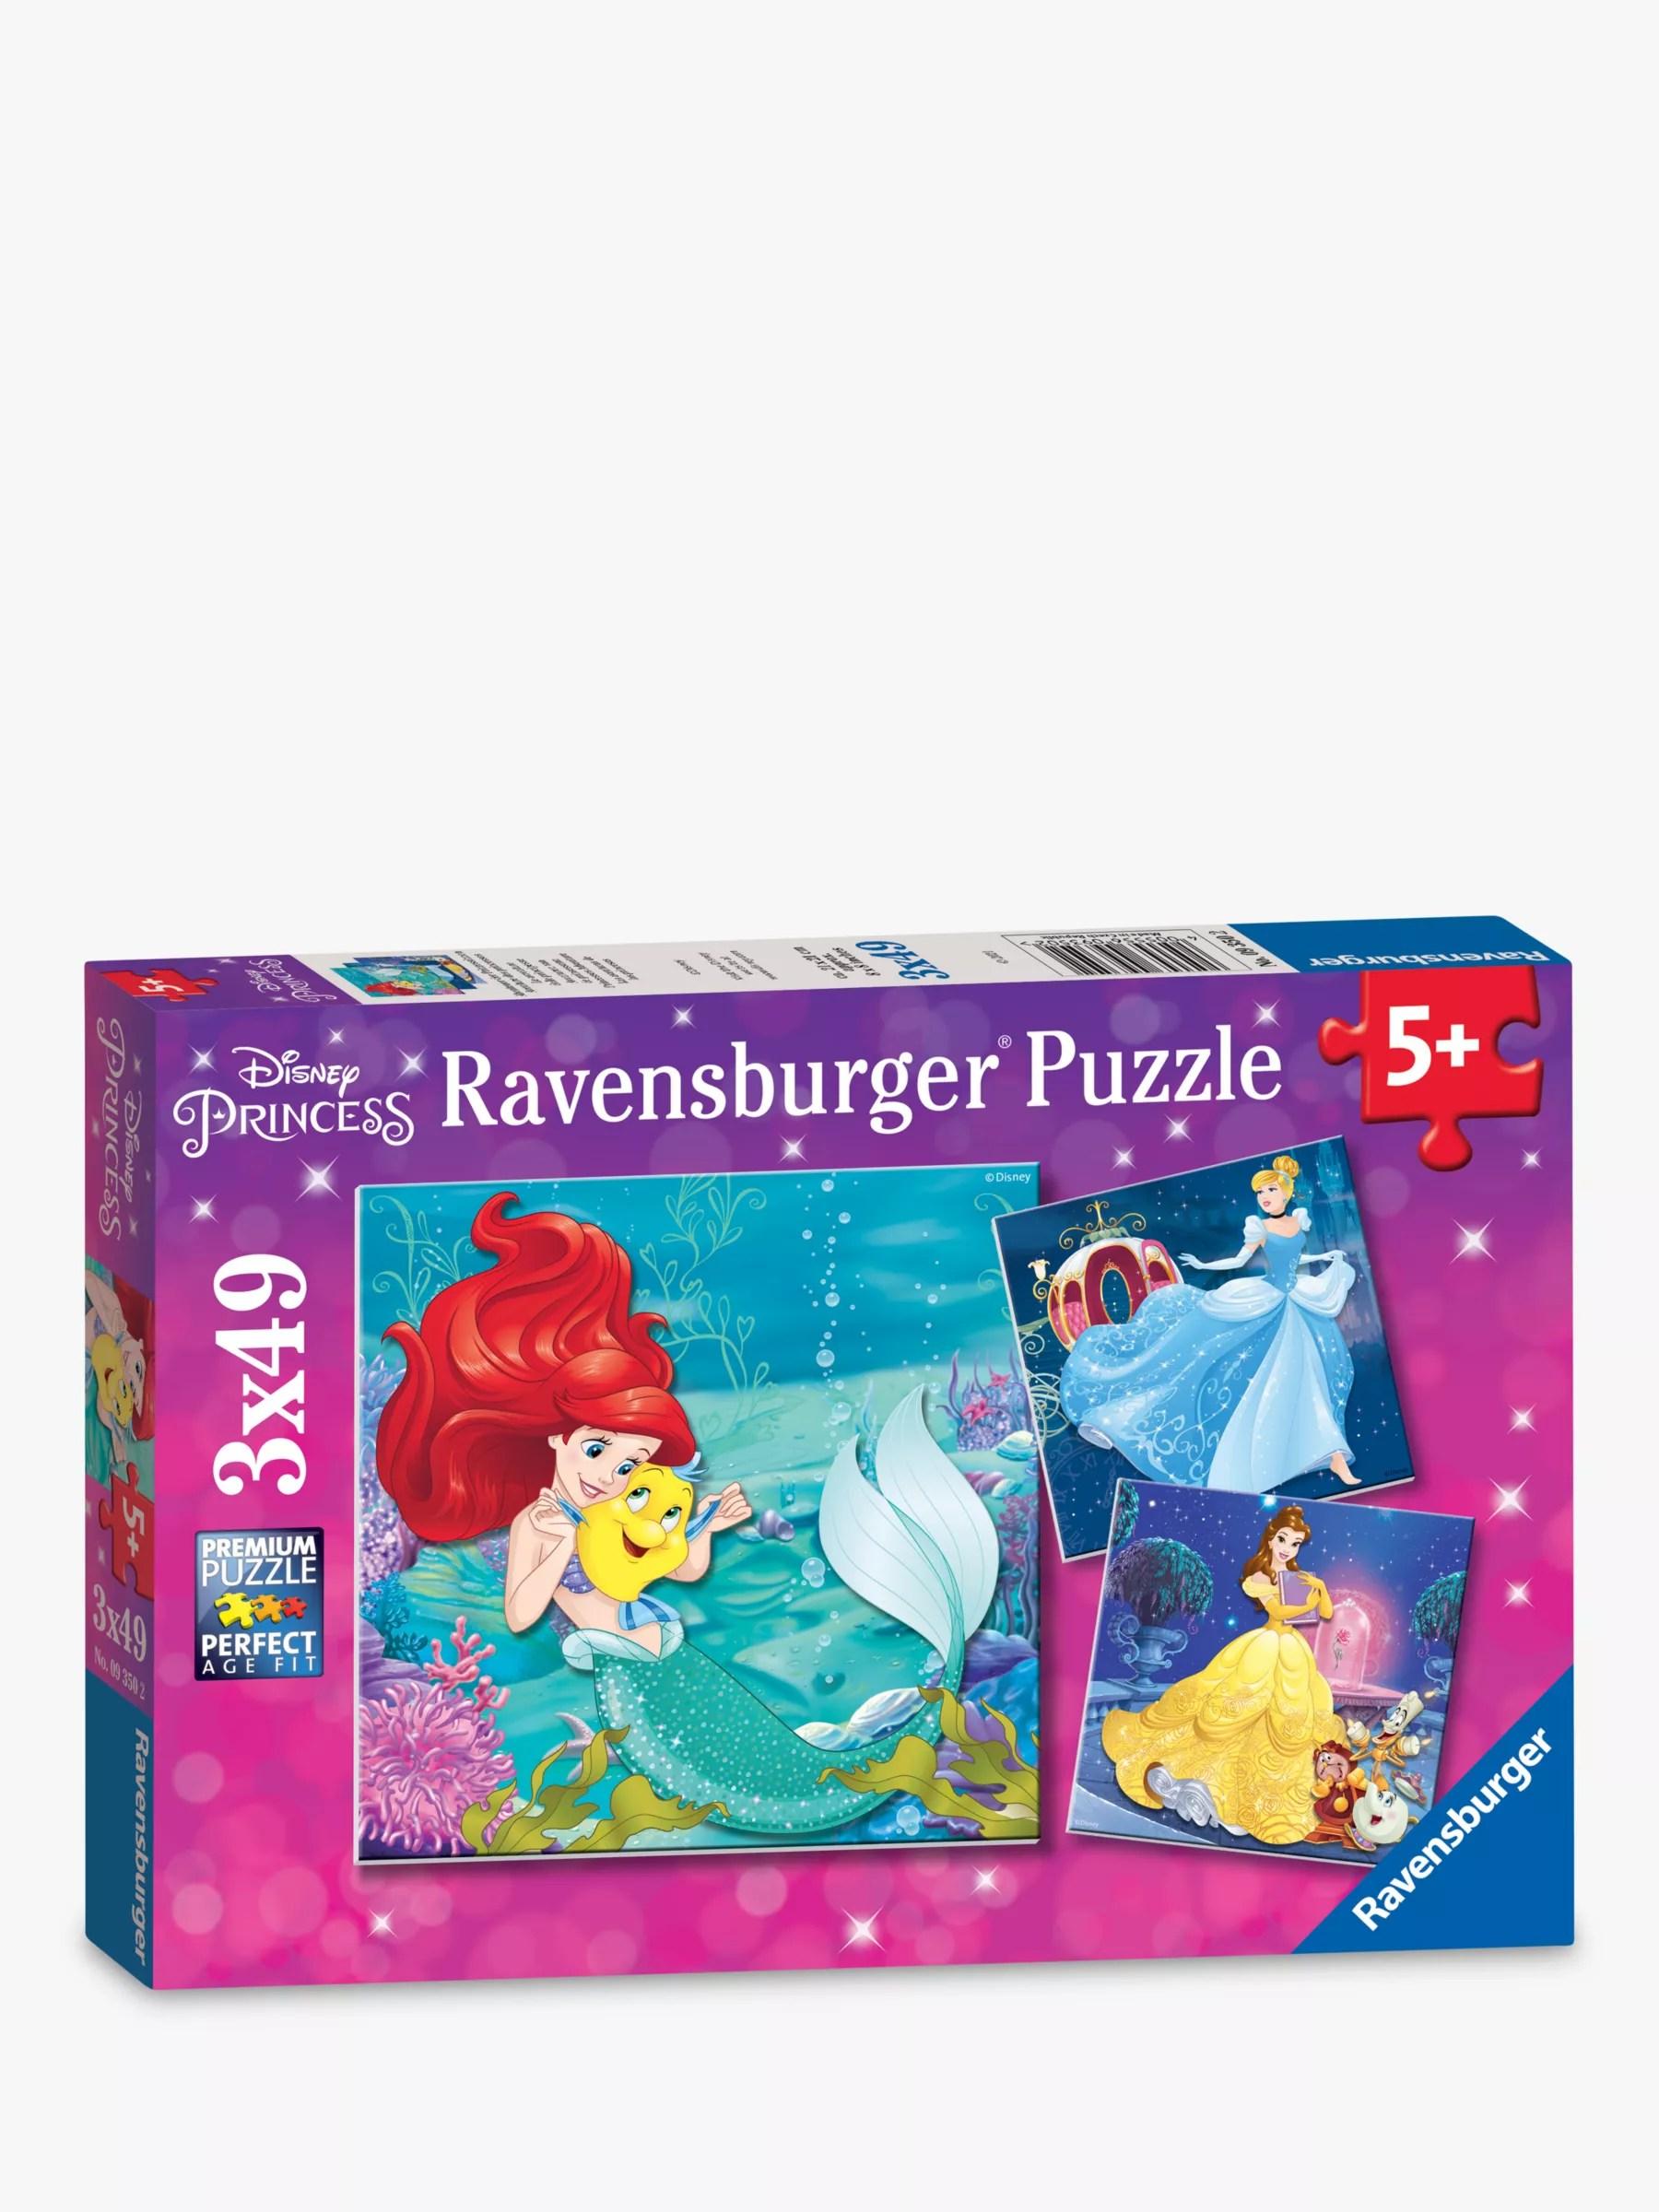 Ravensburger Disney Princess Jigsaw Puzzles Box Of 3